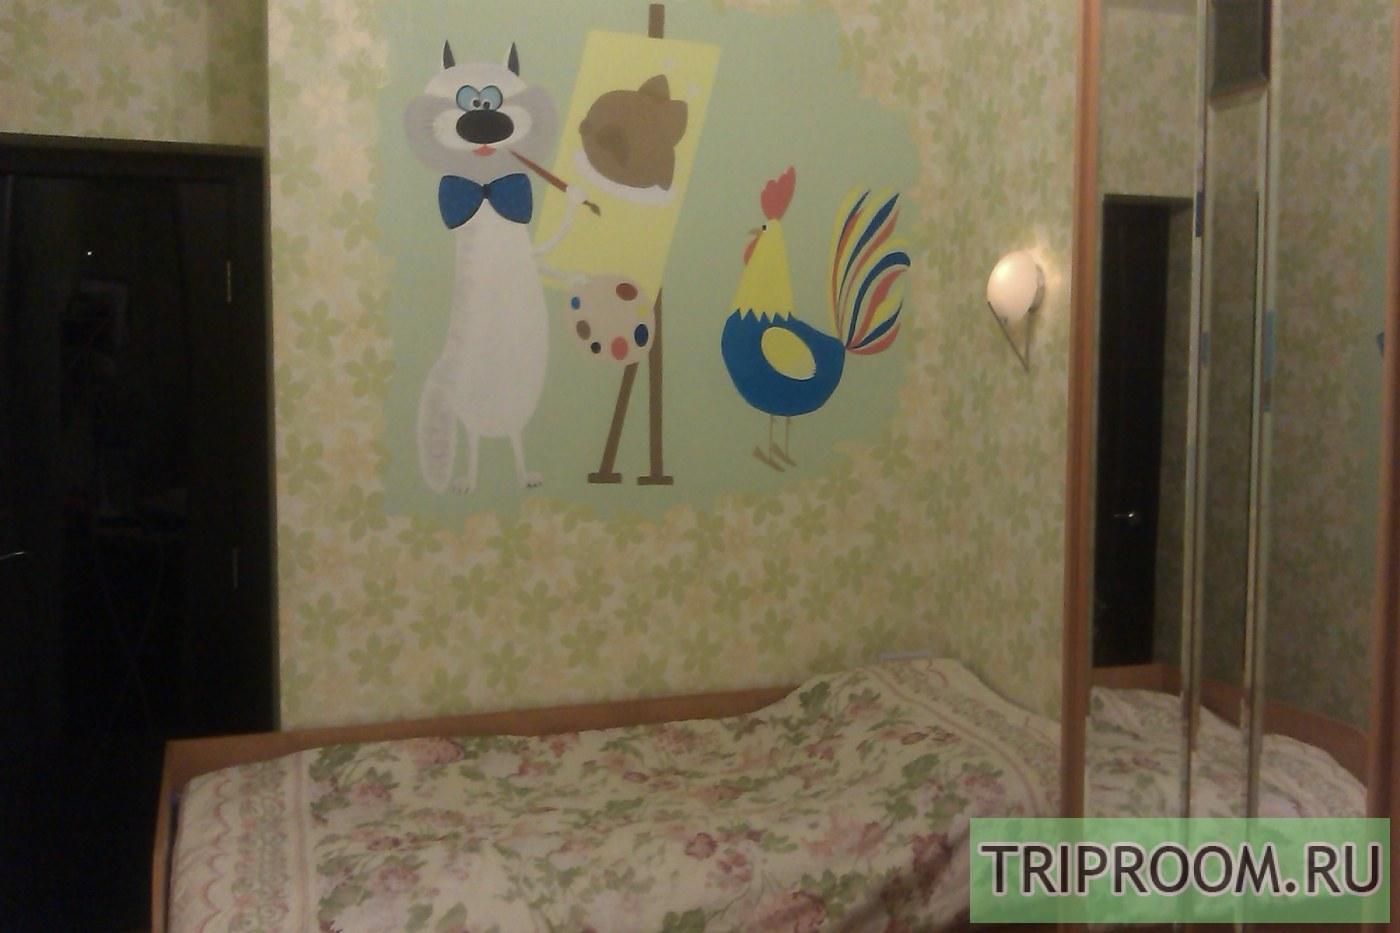 3-комнатная квартира посуточно (вариант № 39631), ул. Кирова улица, фото № 10